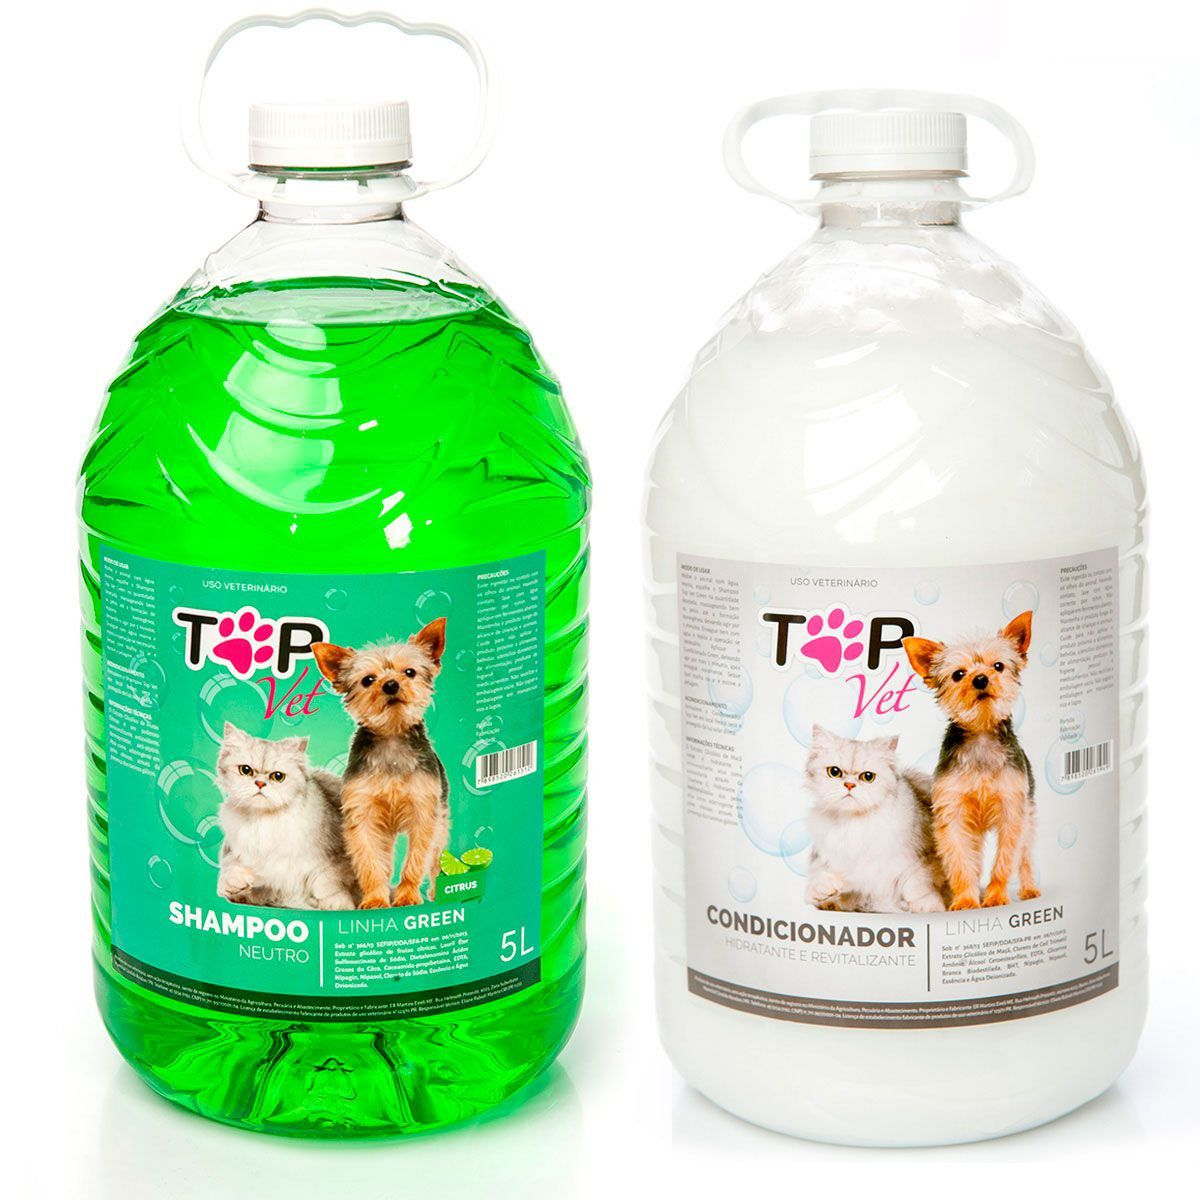 Kit Shampoo Neutro Citrus e Condicionador Green Top Vet